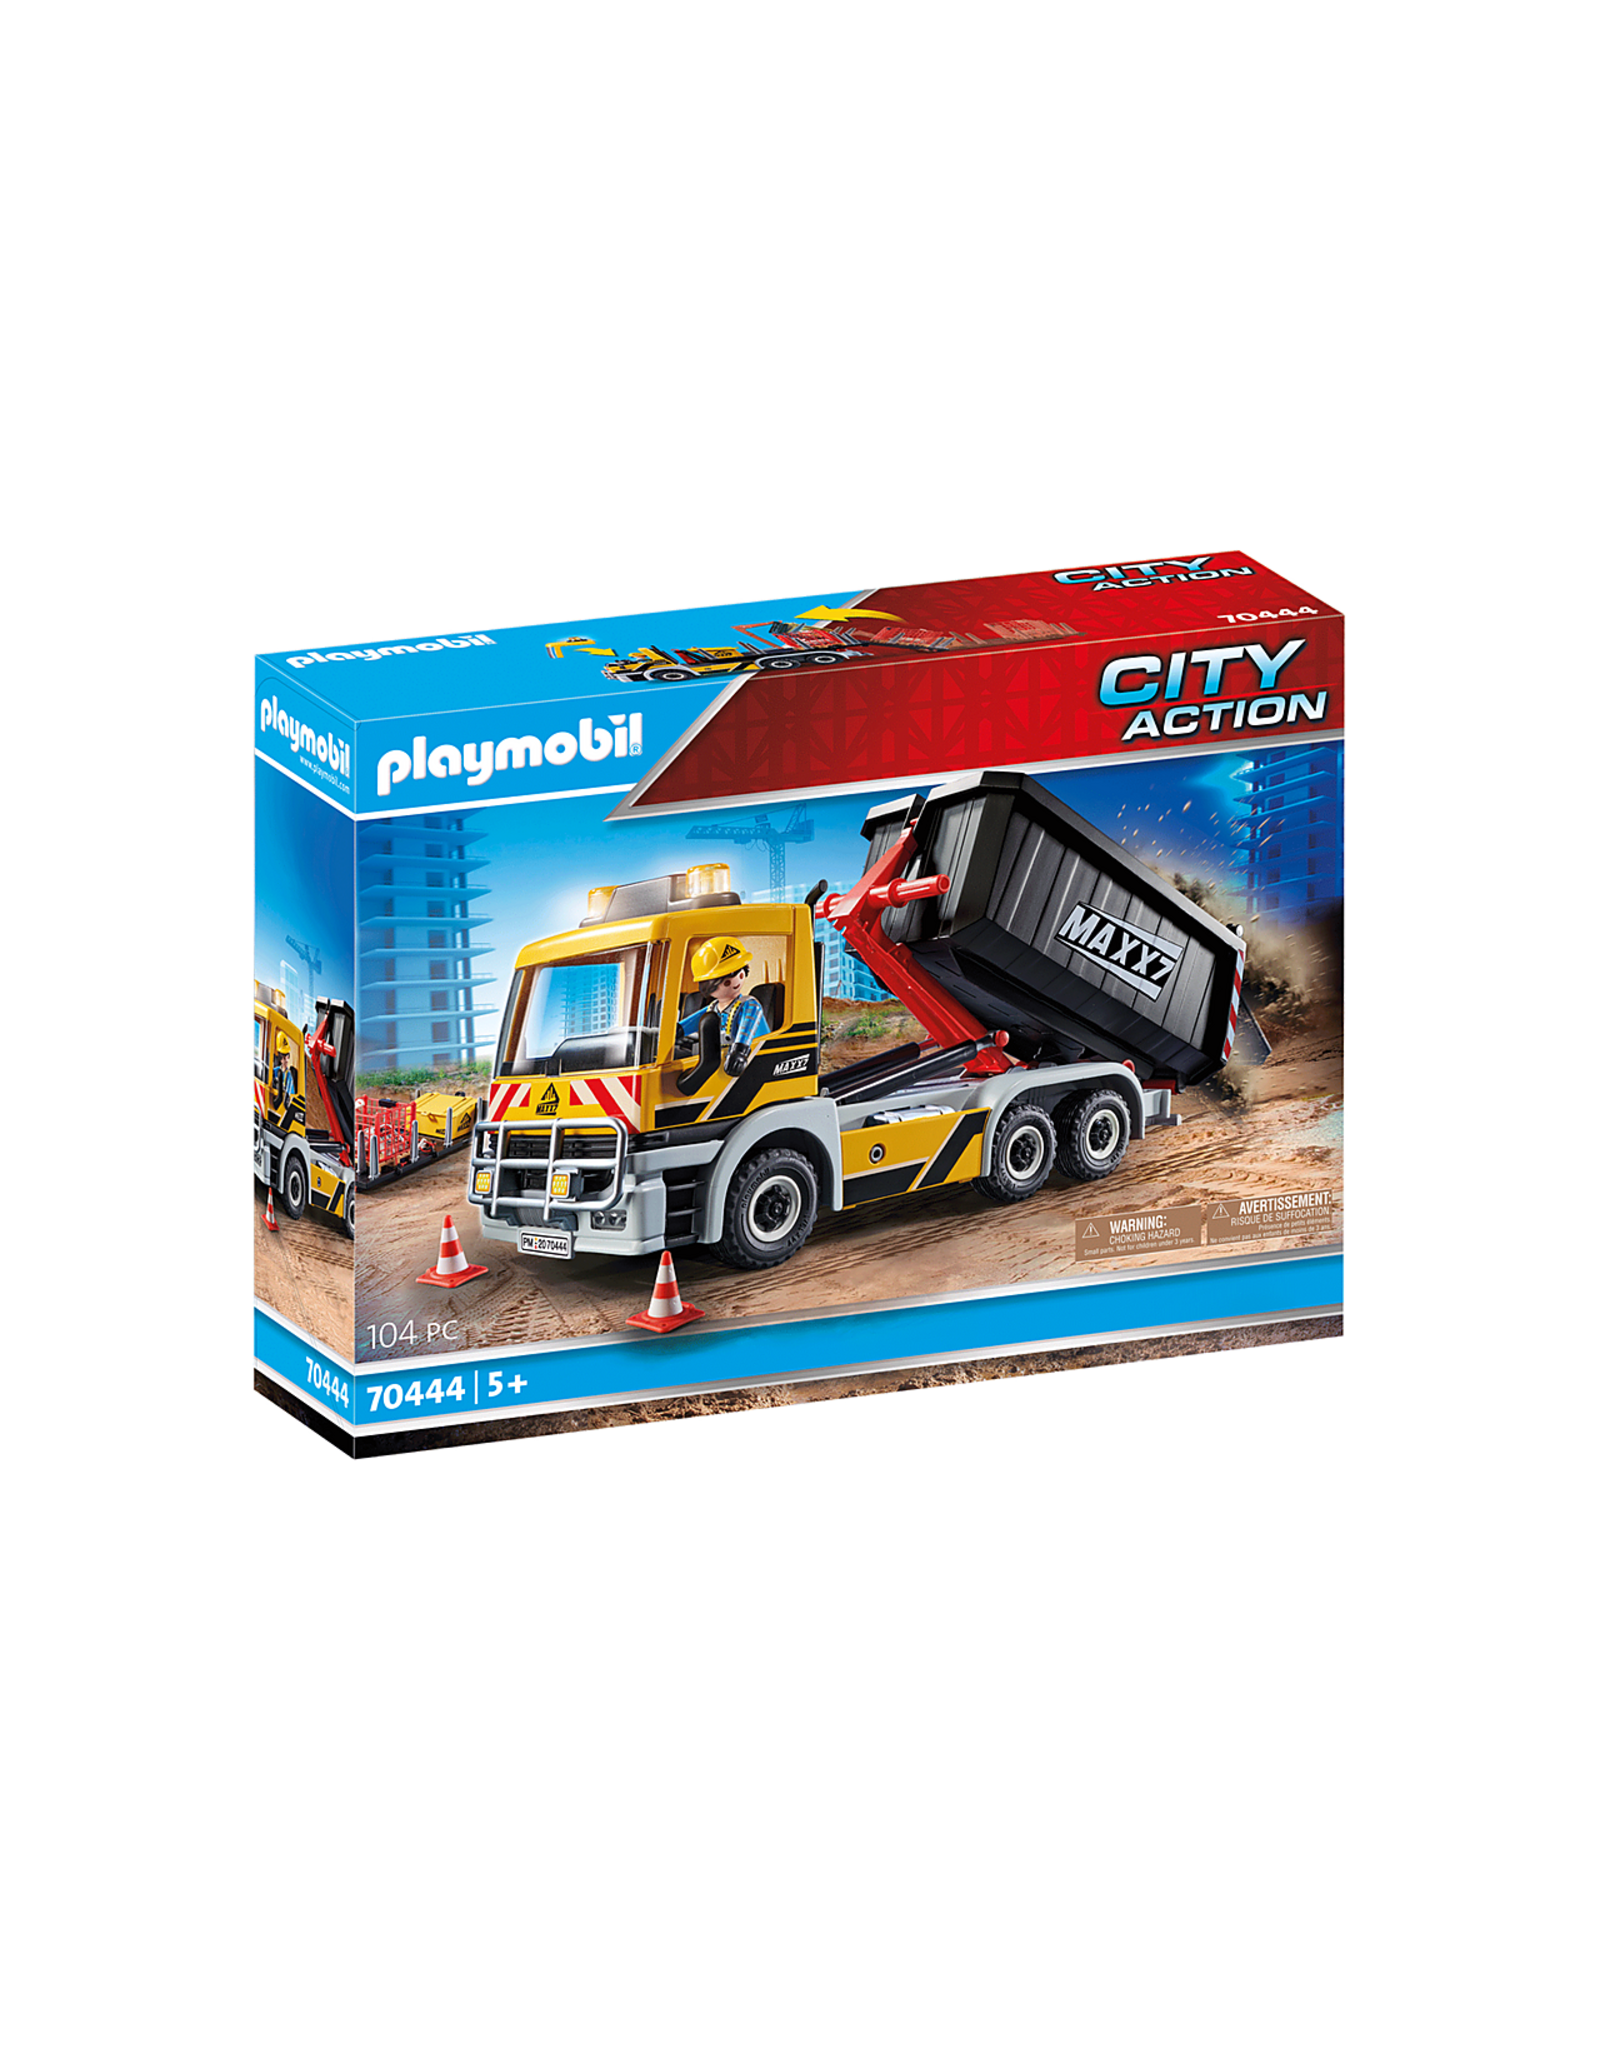 Playmobil Playmobil City Action Interchangeable Truck 70444